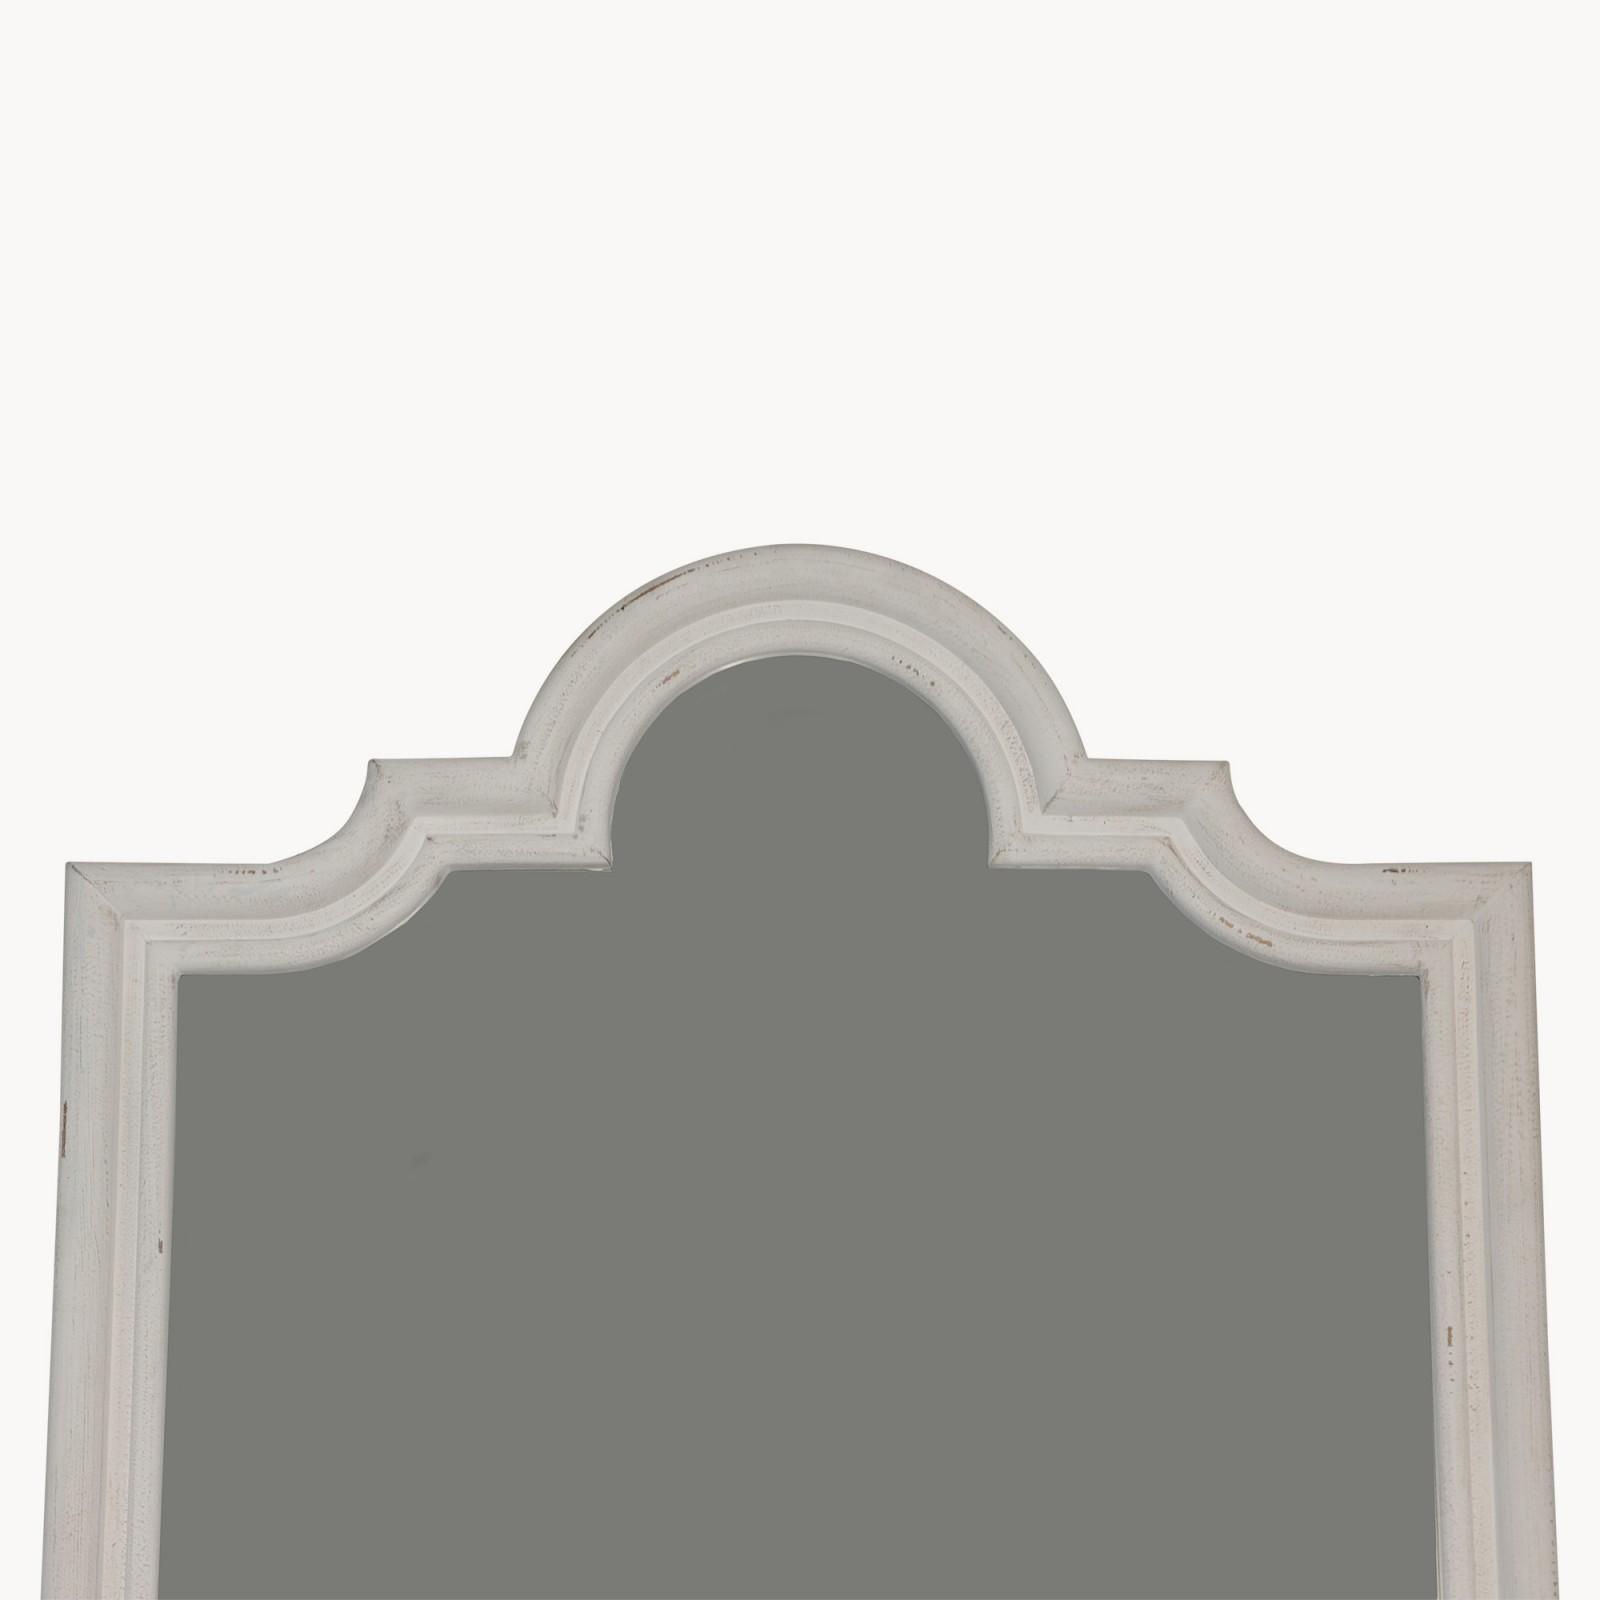 off white large mirror furniture la maison chic luxury. Black Bedroom Furniture Sets. Home Design Ideas